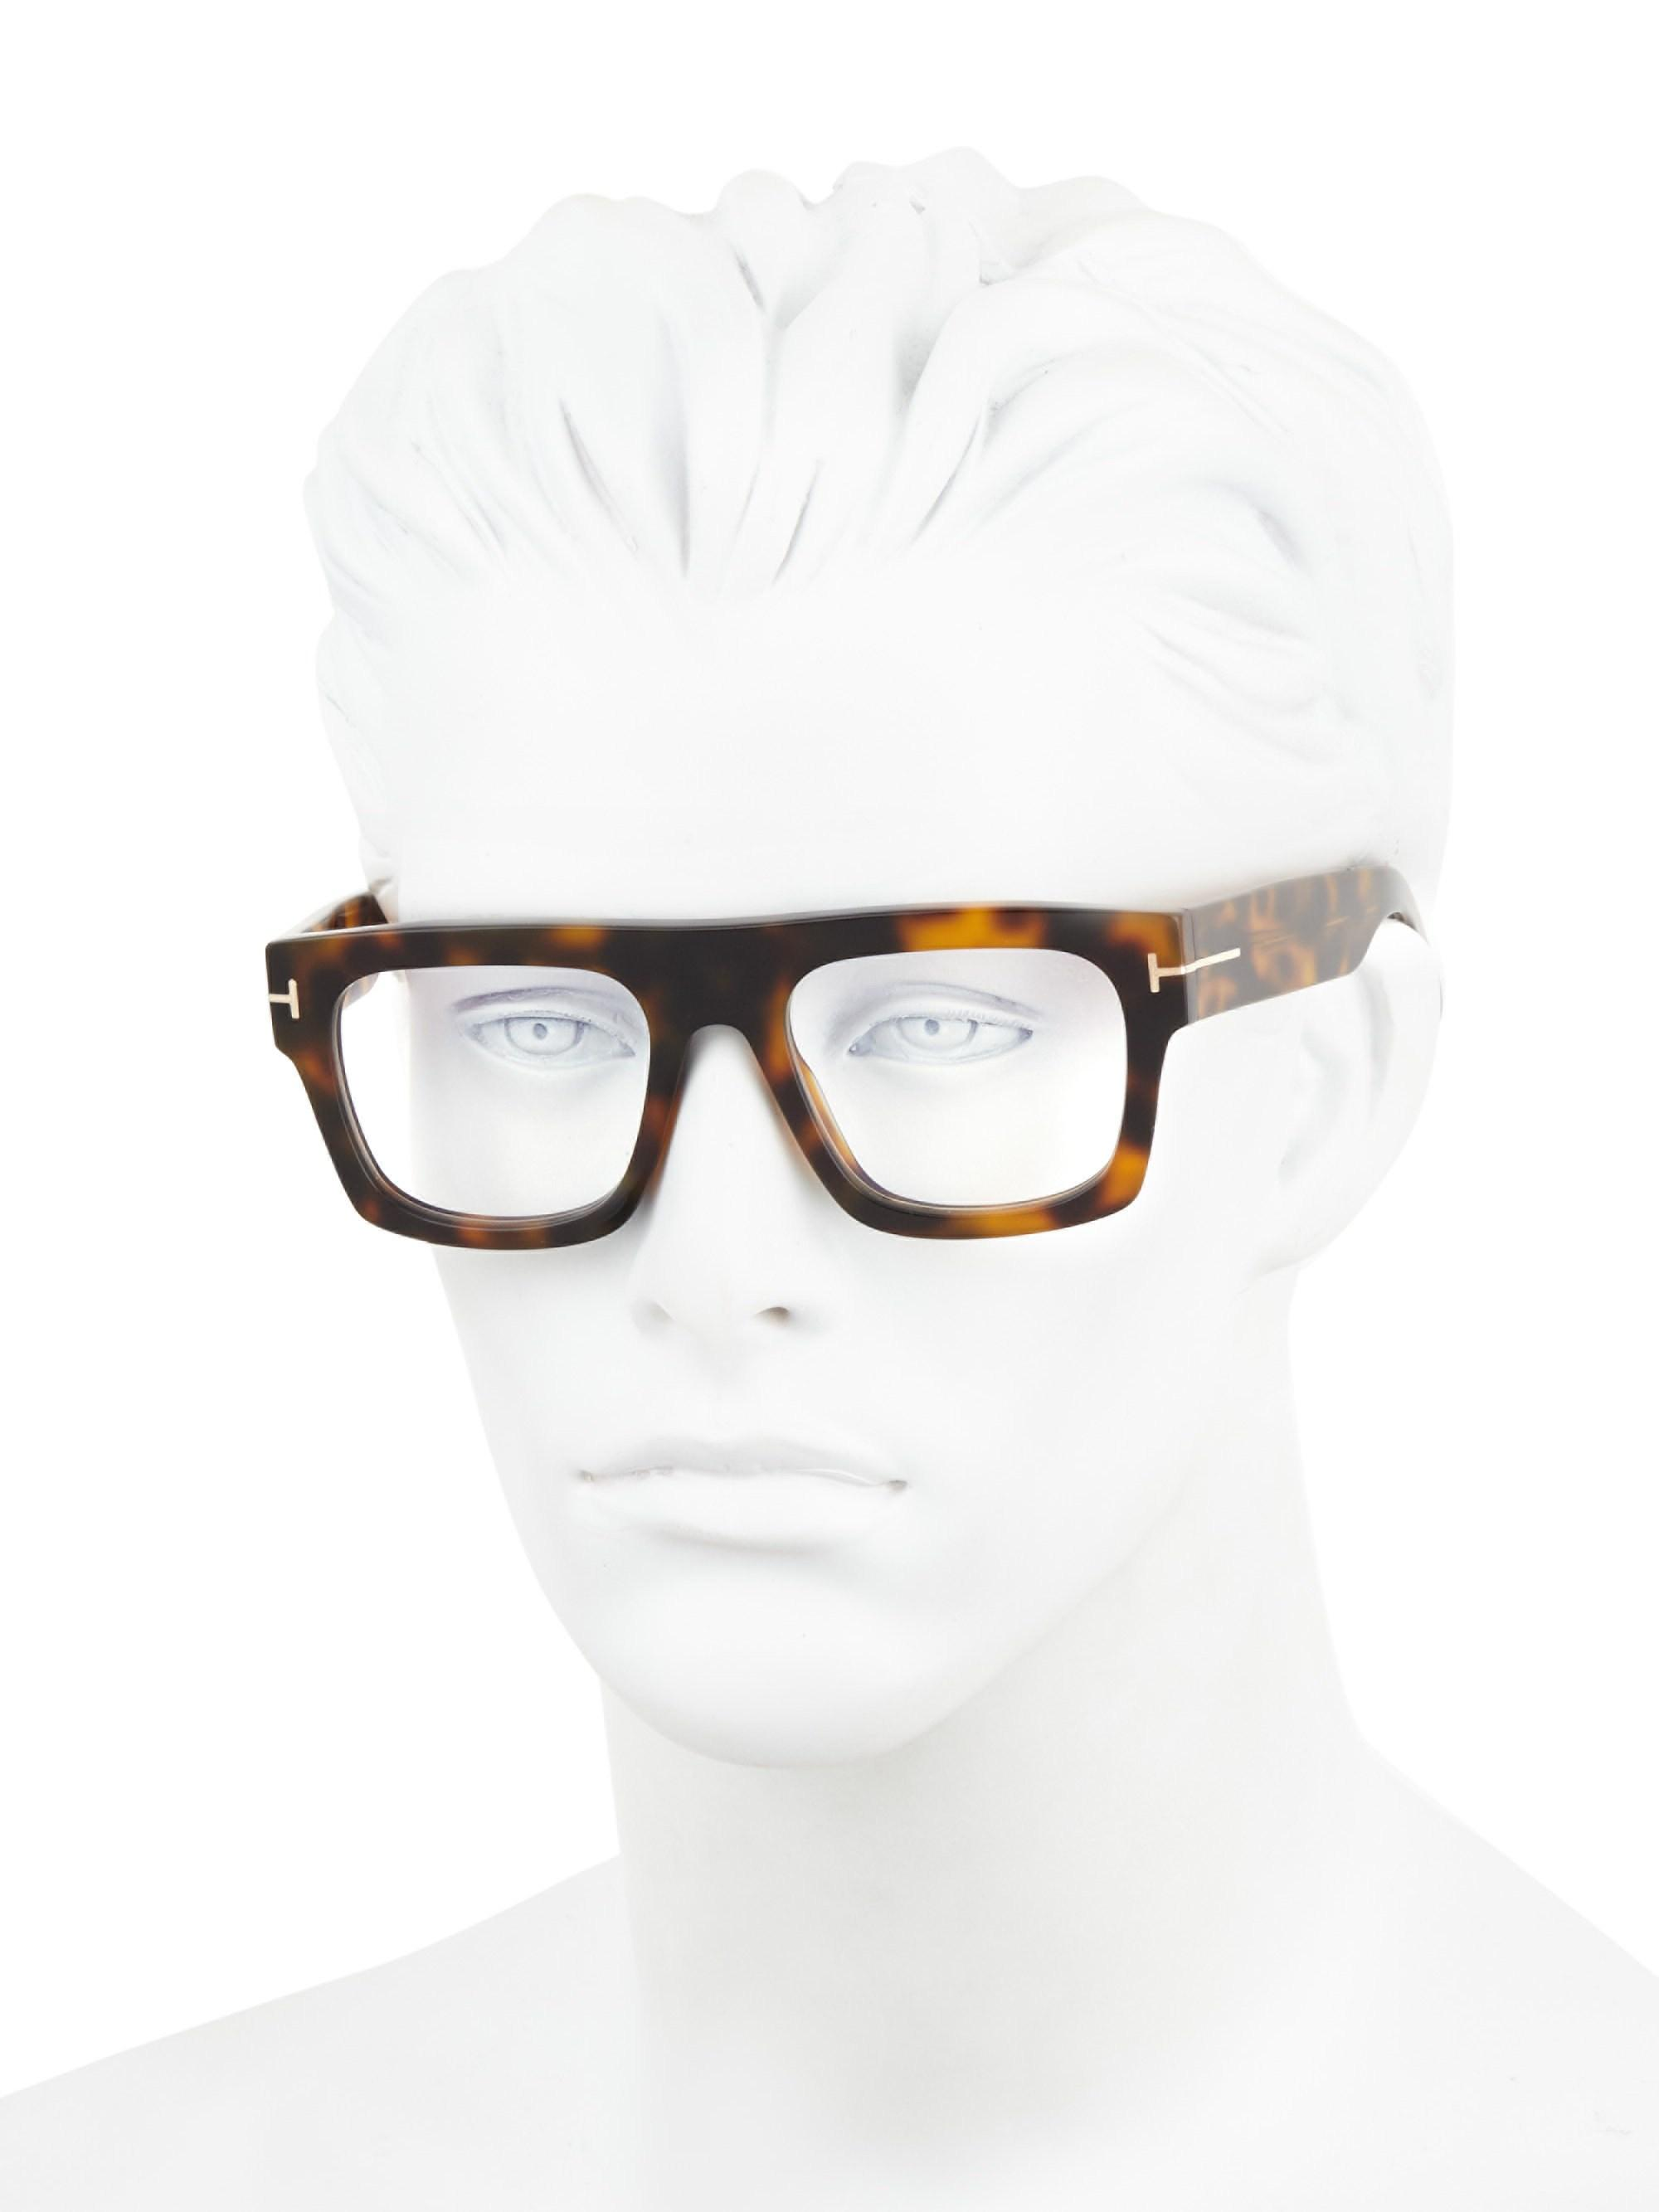 54285cd648 Tom Ford Blue Block 53mm Square Optical Glasses in Brown for Men - Lyst